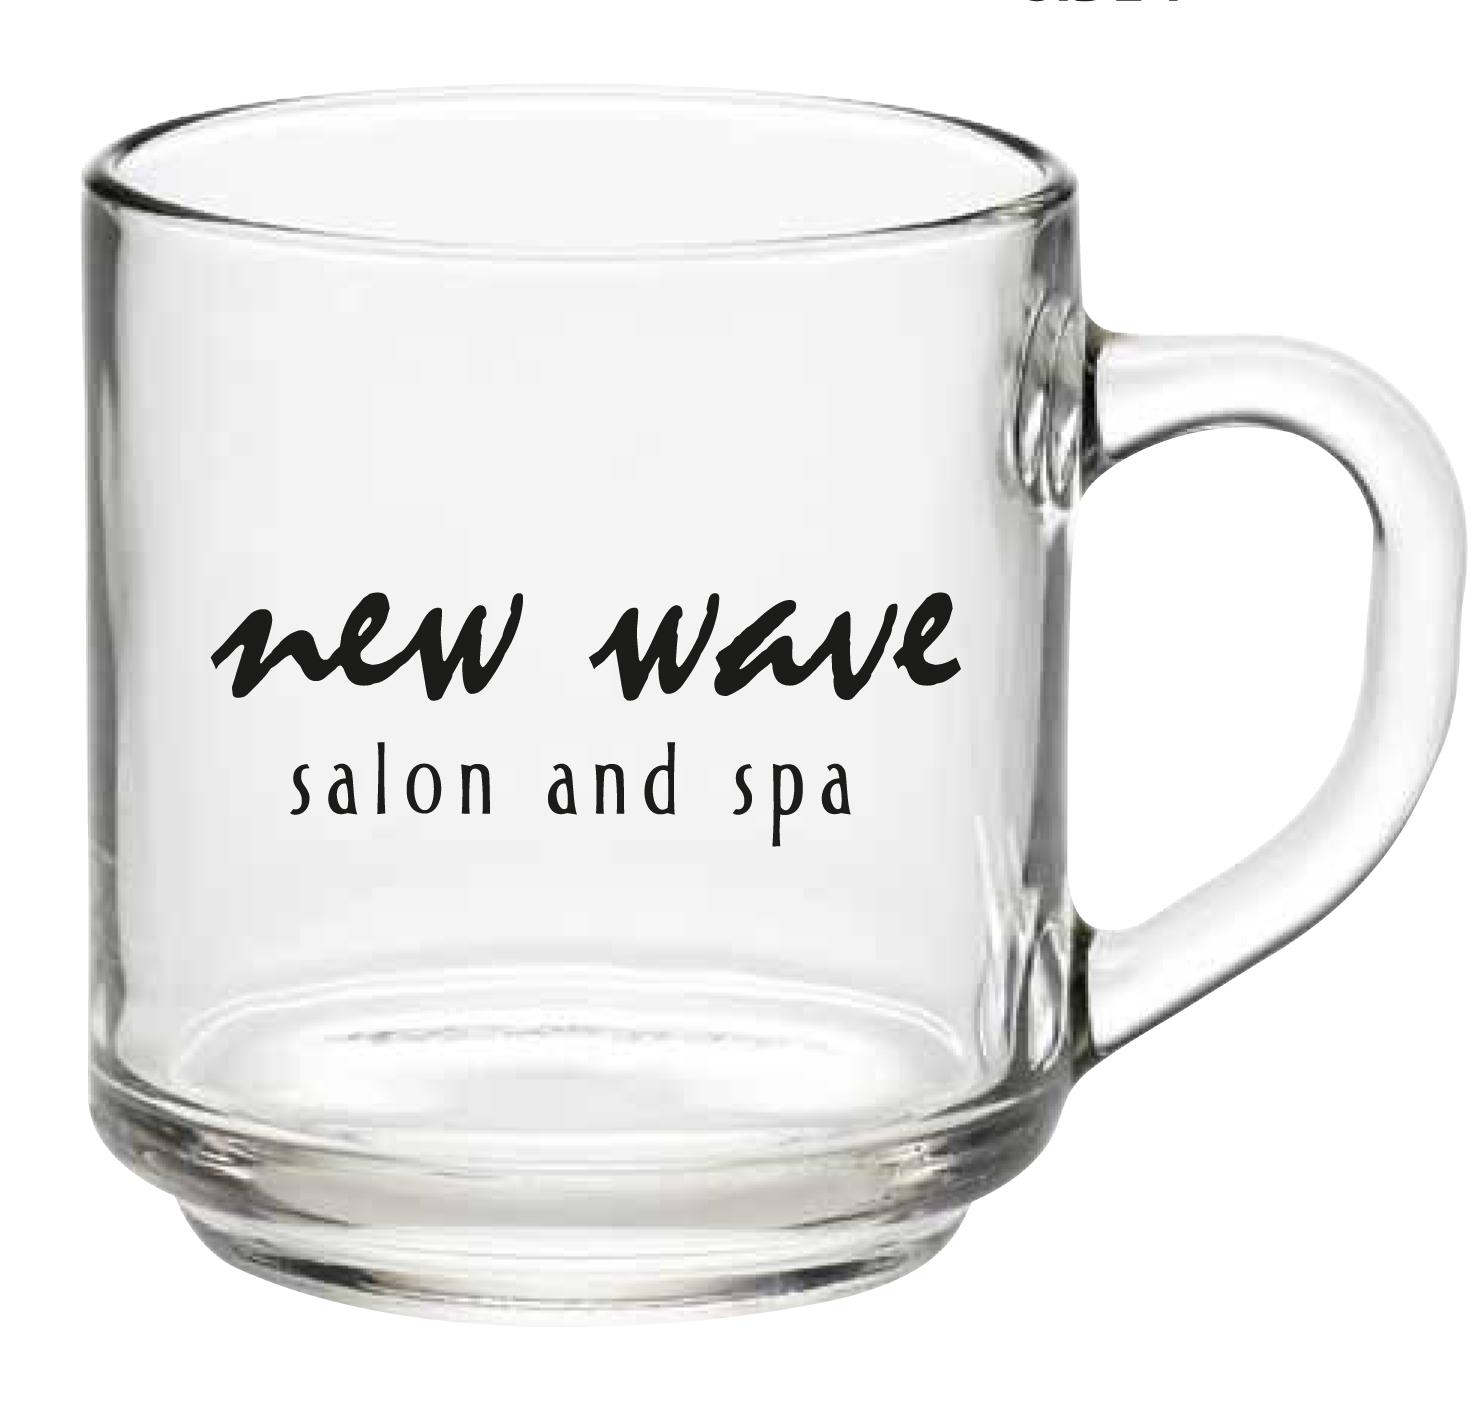 ABC-Design---New-Wave-Salon-and-Spa---10oz-Glass-Mug---1-Side---Black.jpg